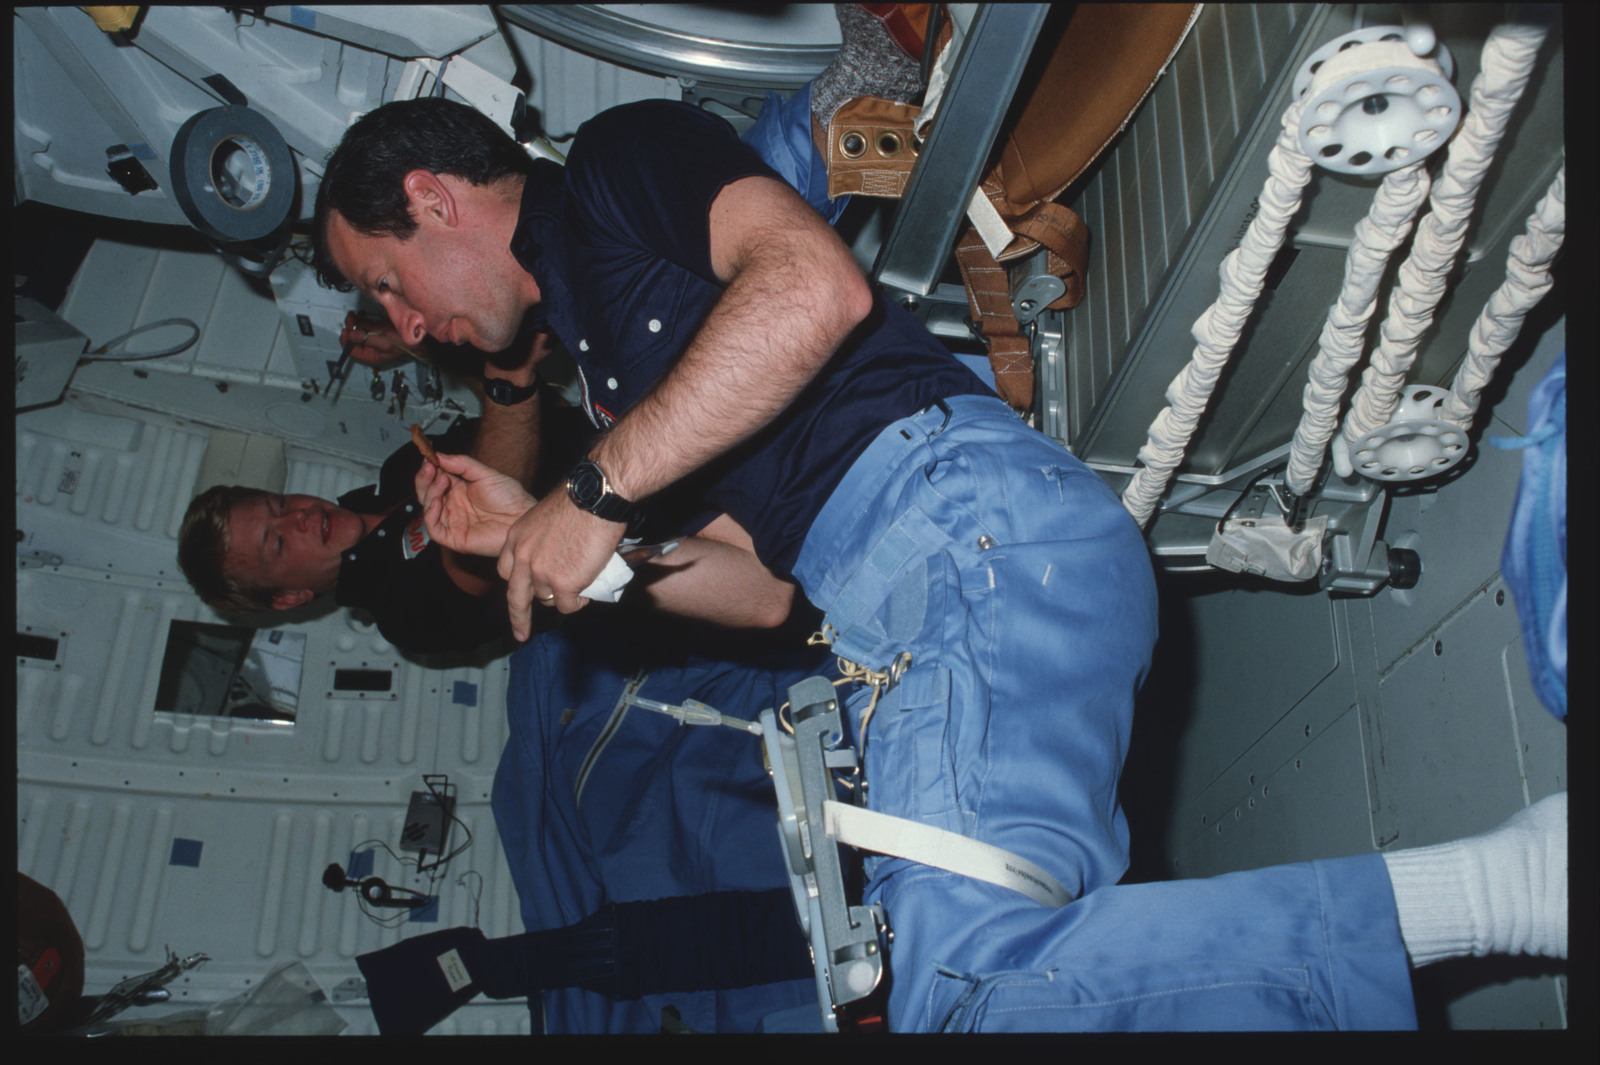 41C-07-249 - STS-41C - Candid views of STS-41C crew preparing food on middeck